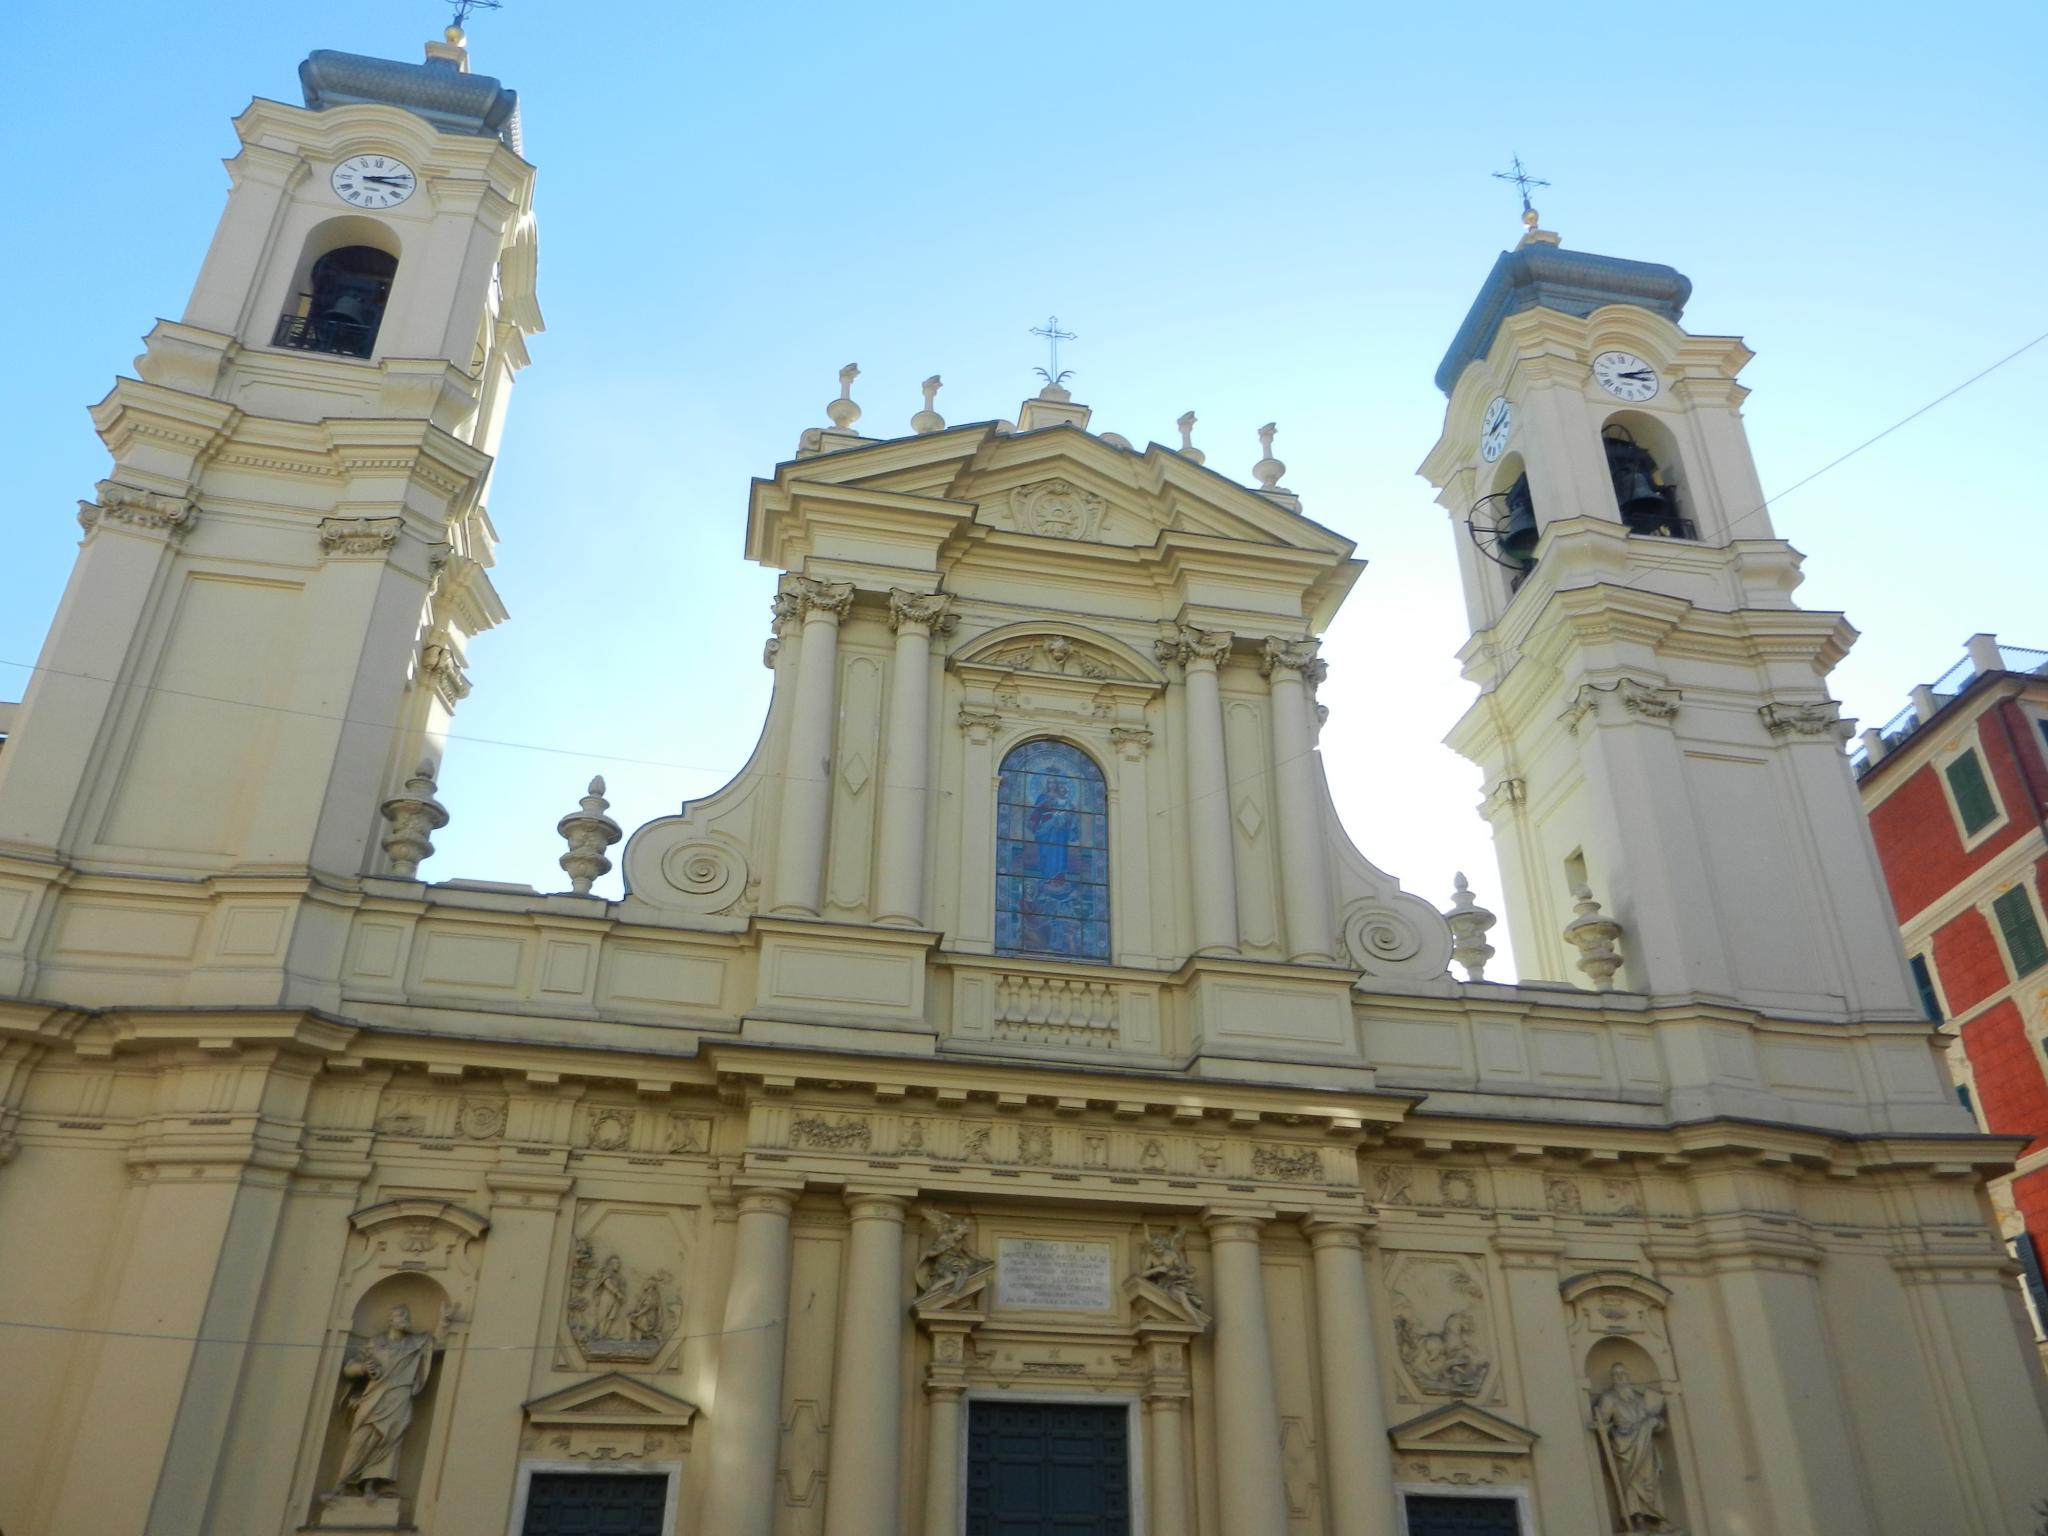 basilica di santa margherita d'antiochia